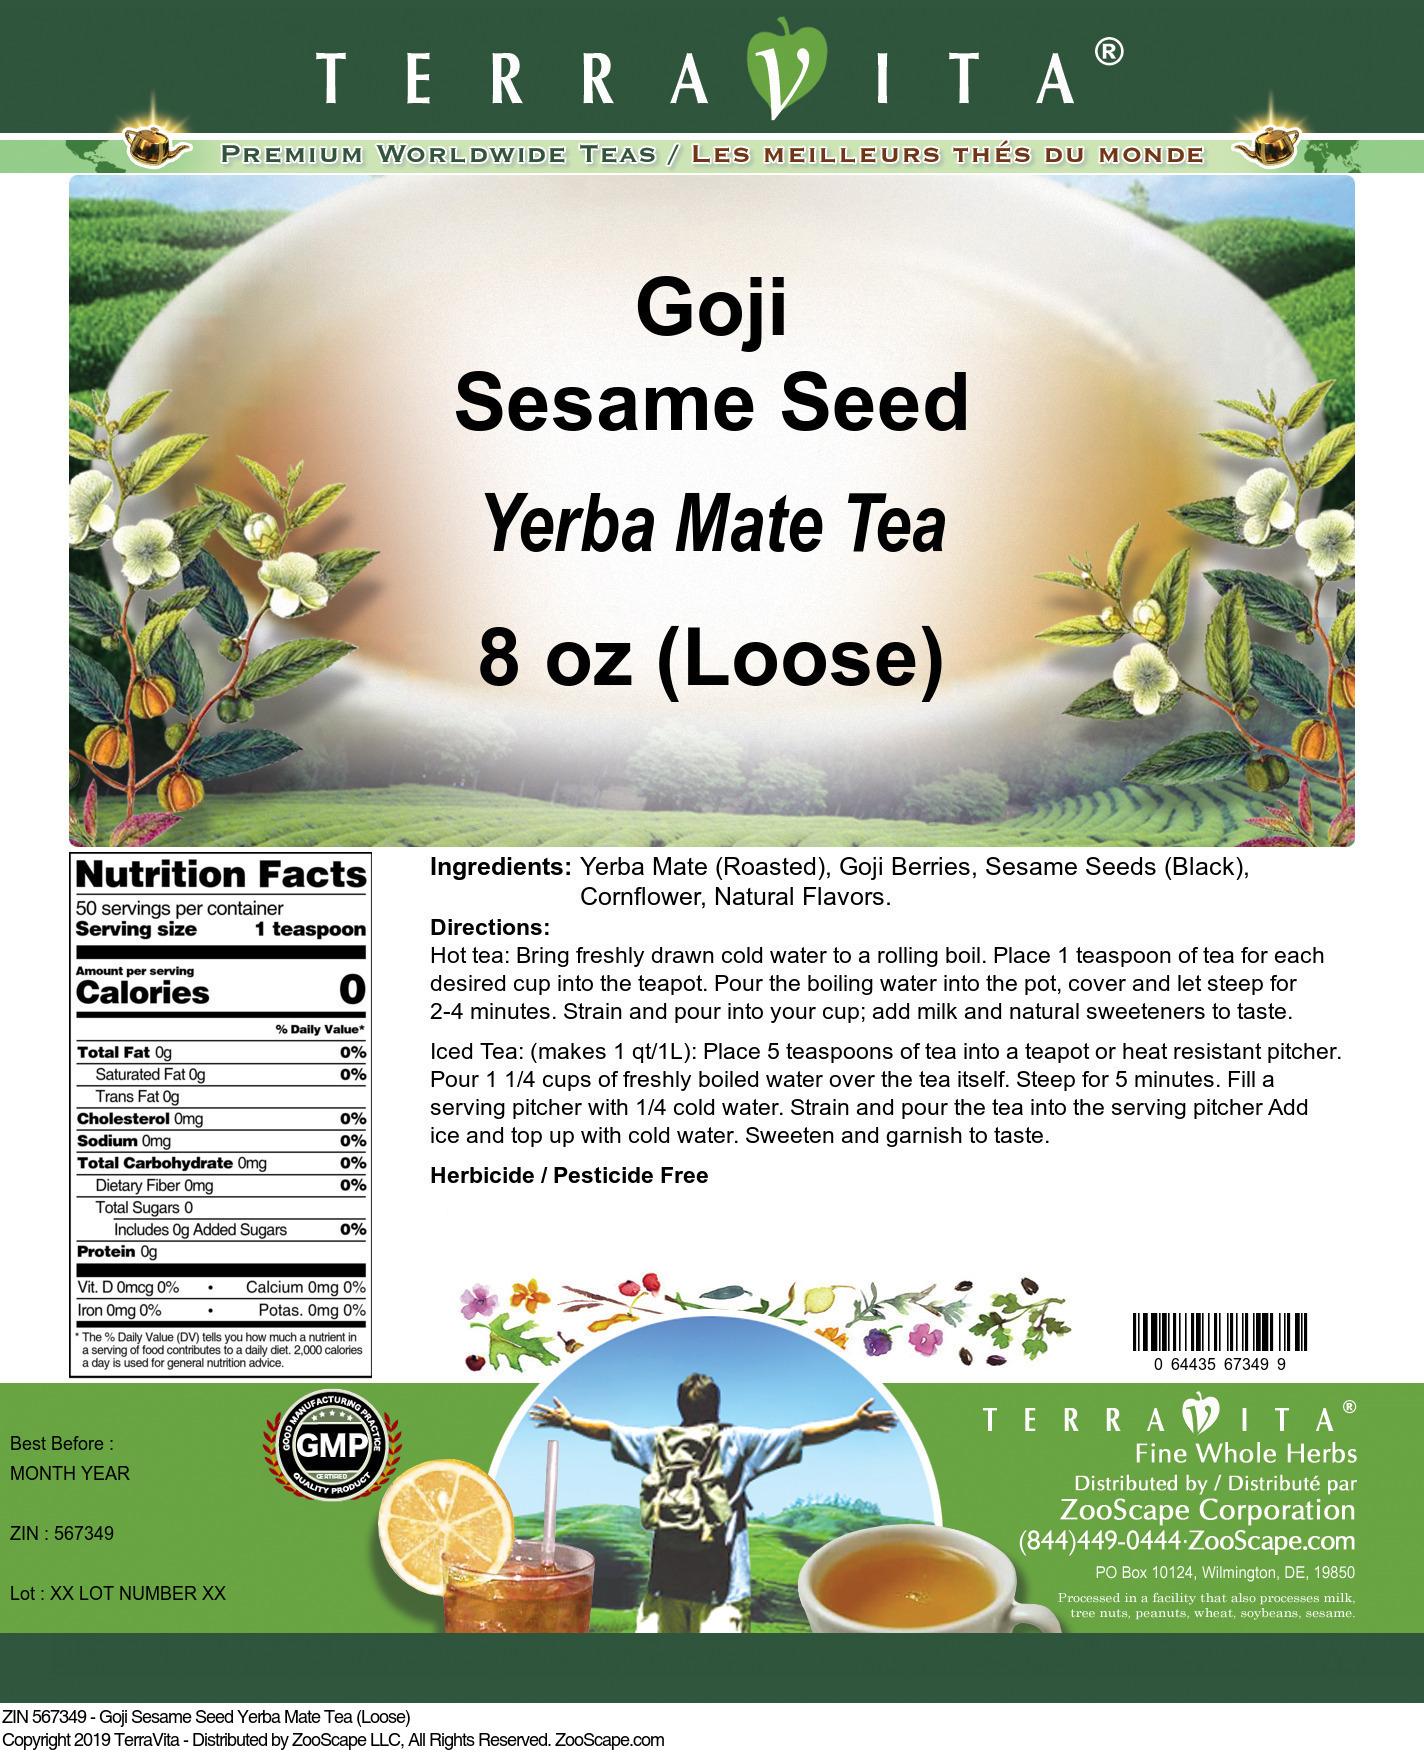 Goji Sesame Seed Yerba Mate Tea (Loose)